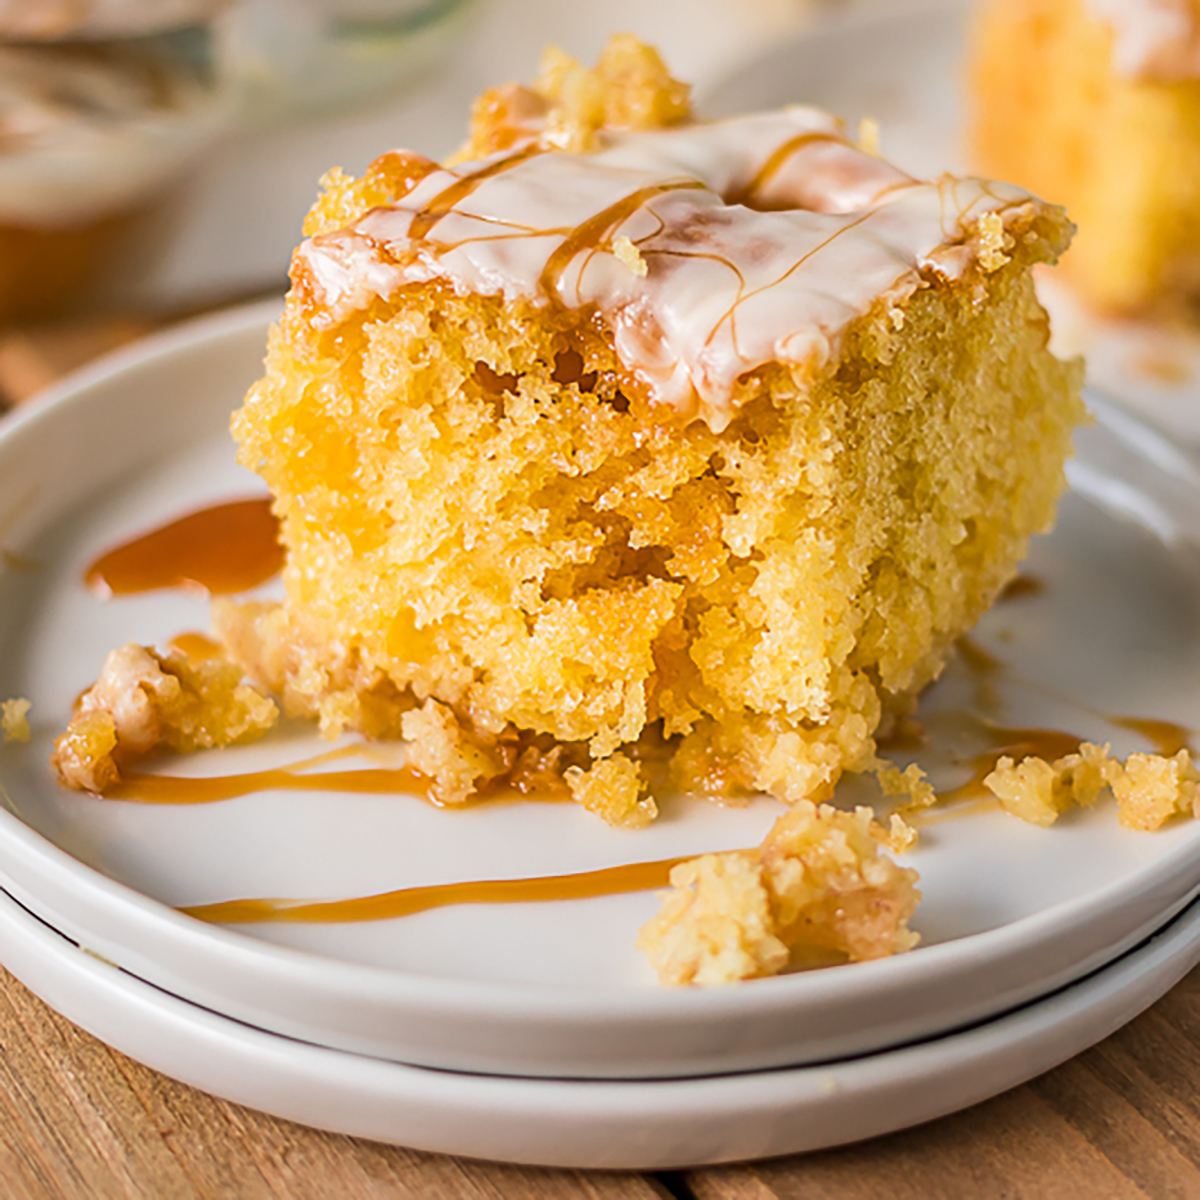 slice of caramel apple poke cake on white plates drizzled with caramel